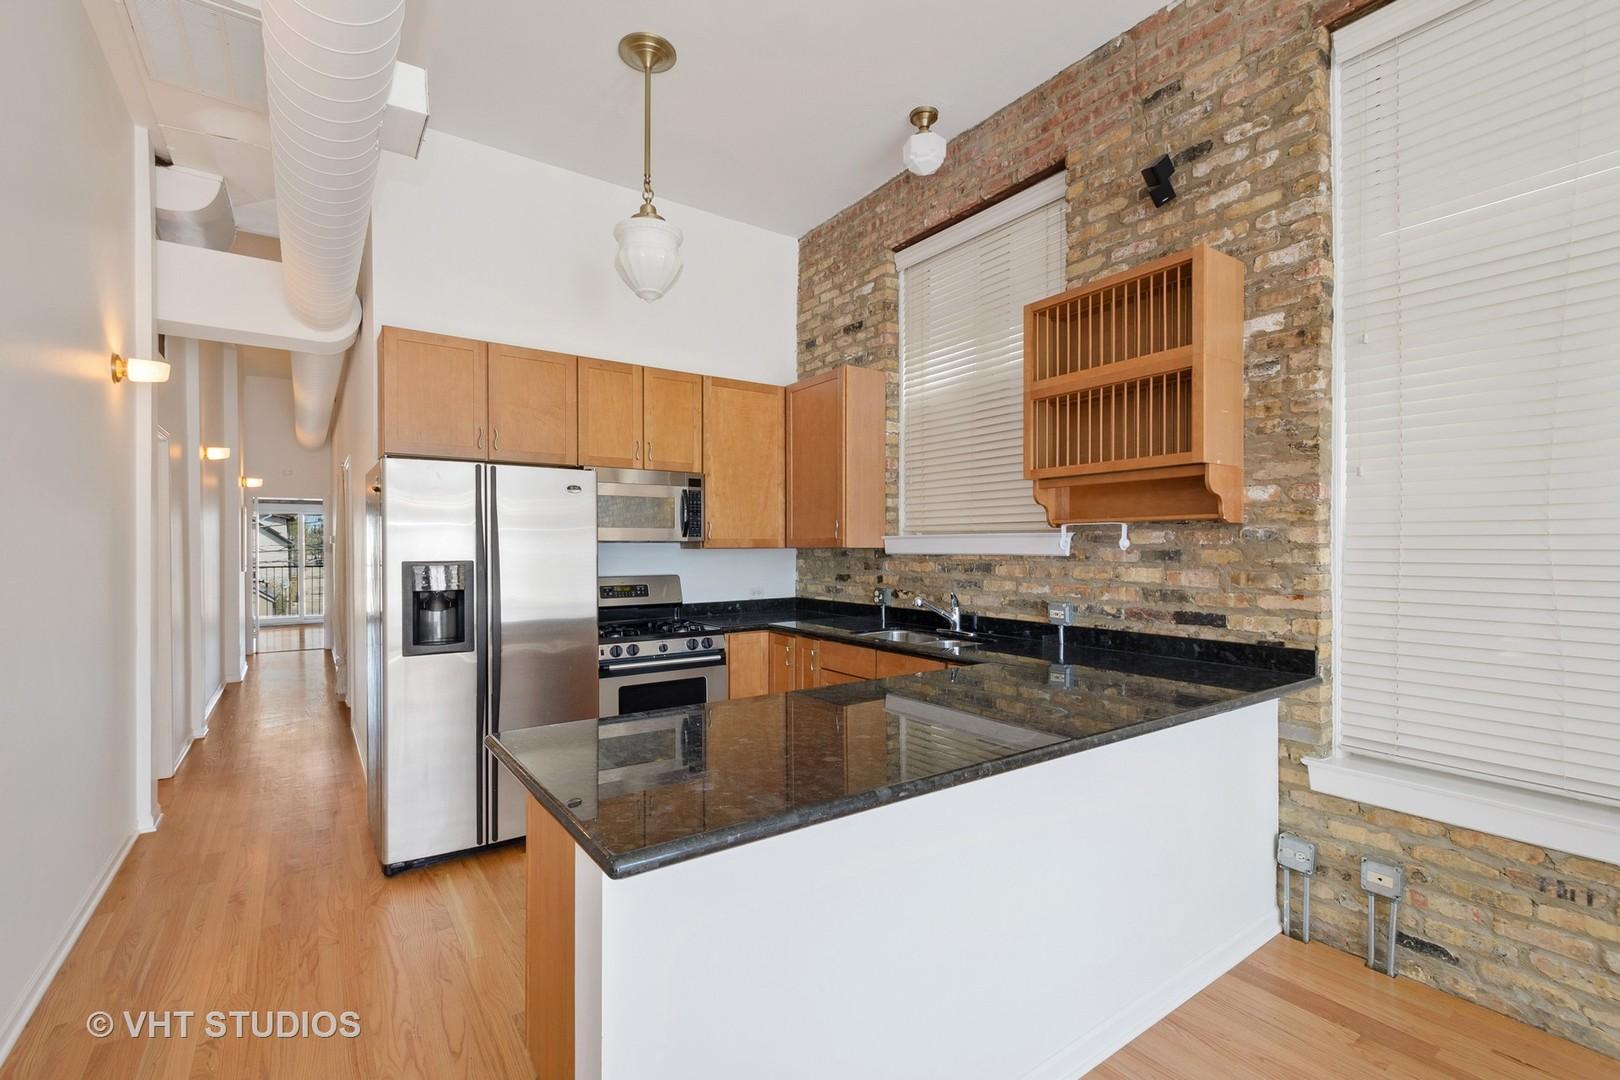 1012 W Diversey Pkwy apartments for rent at AptAmigo